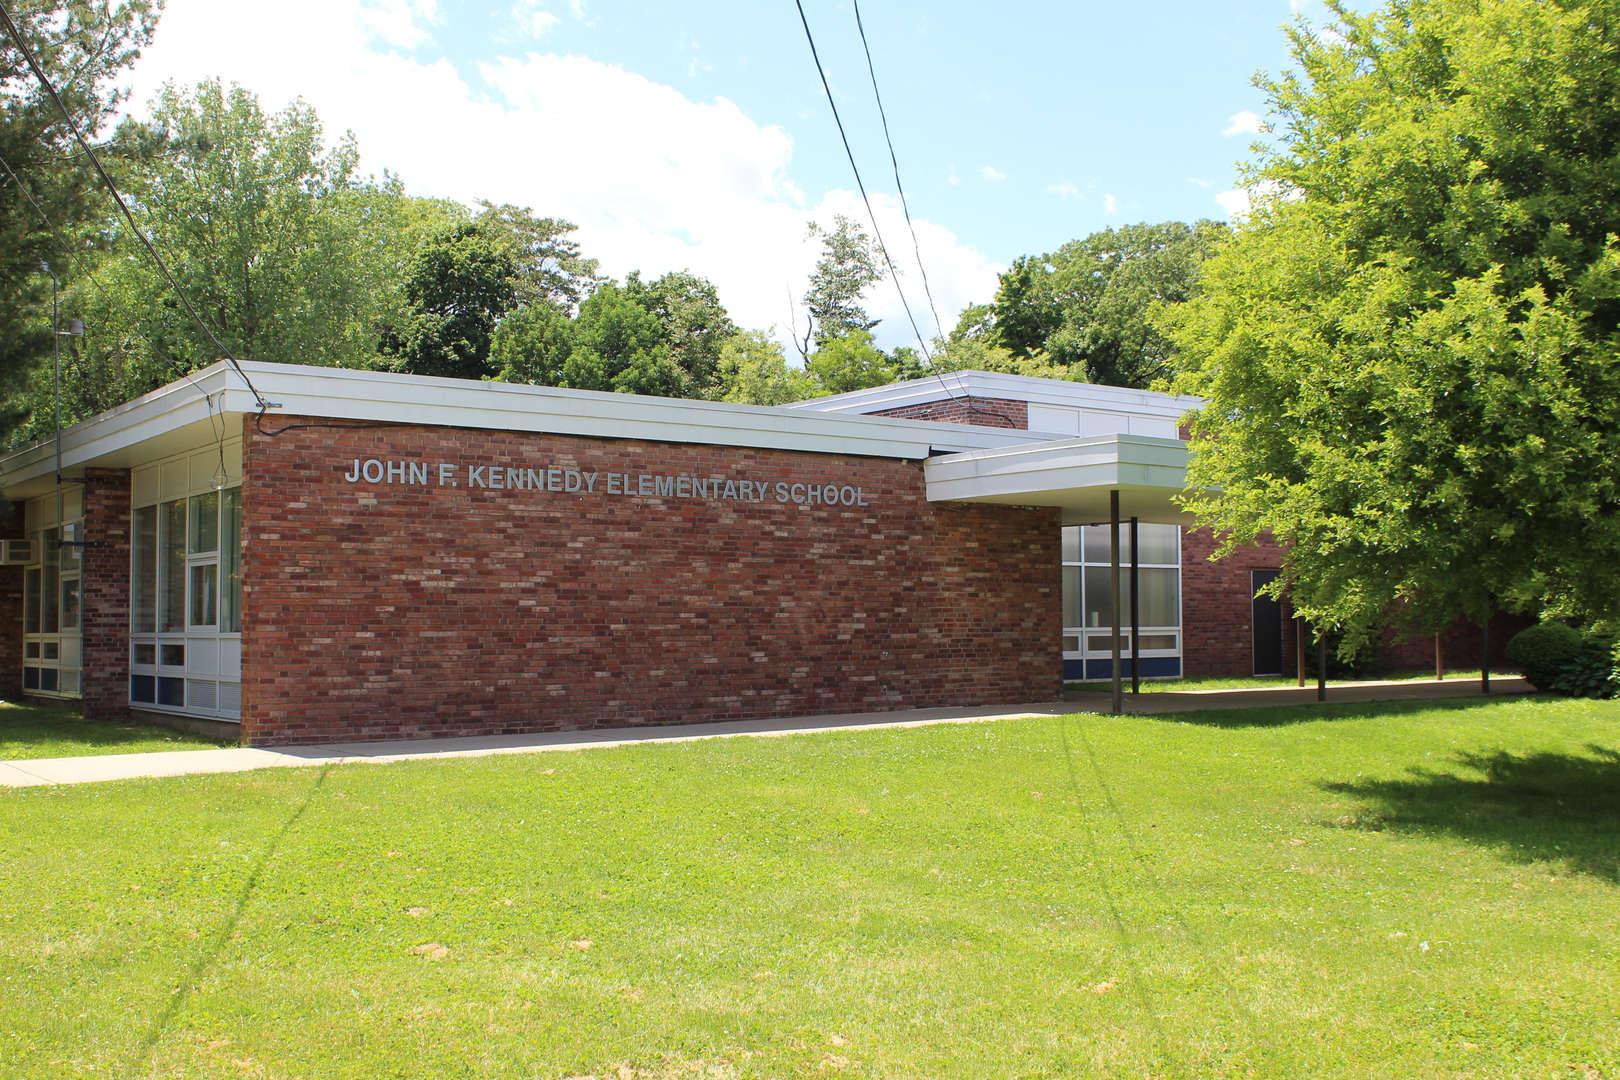 John F. Kennedy Elementary School